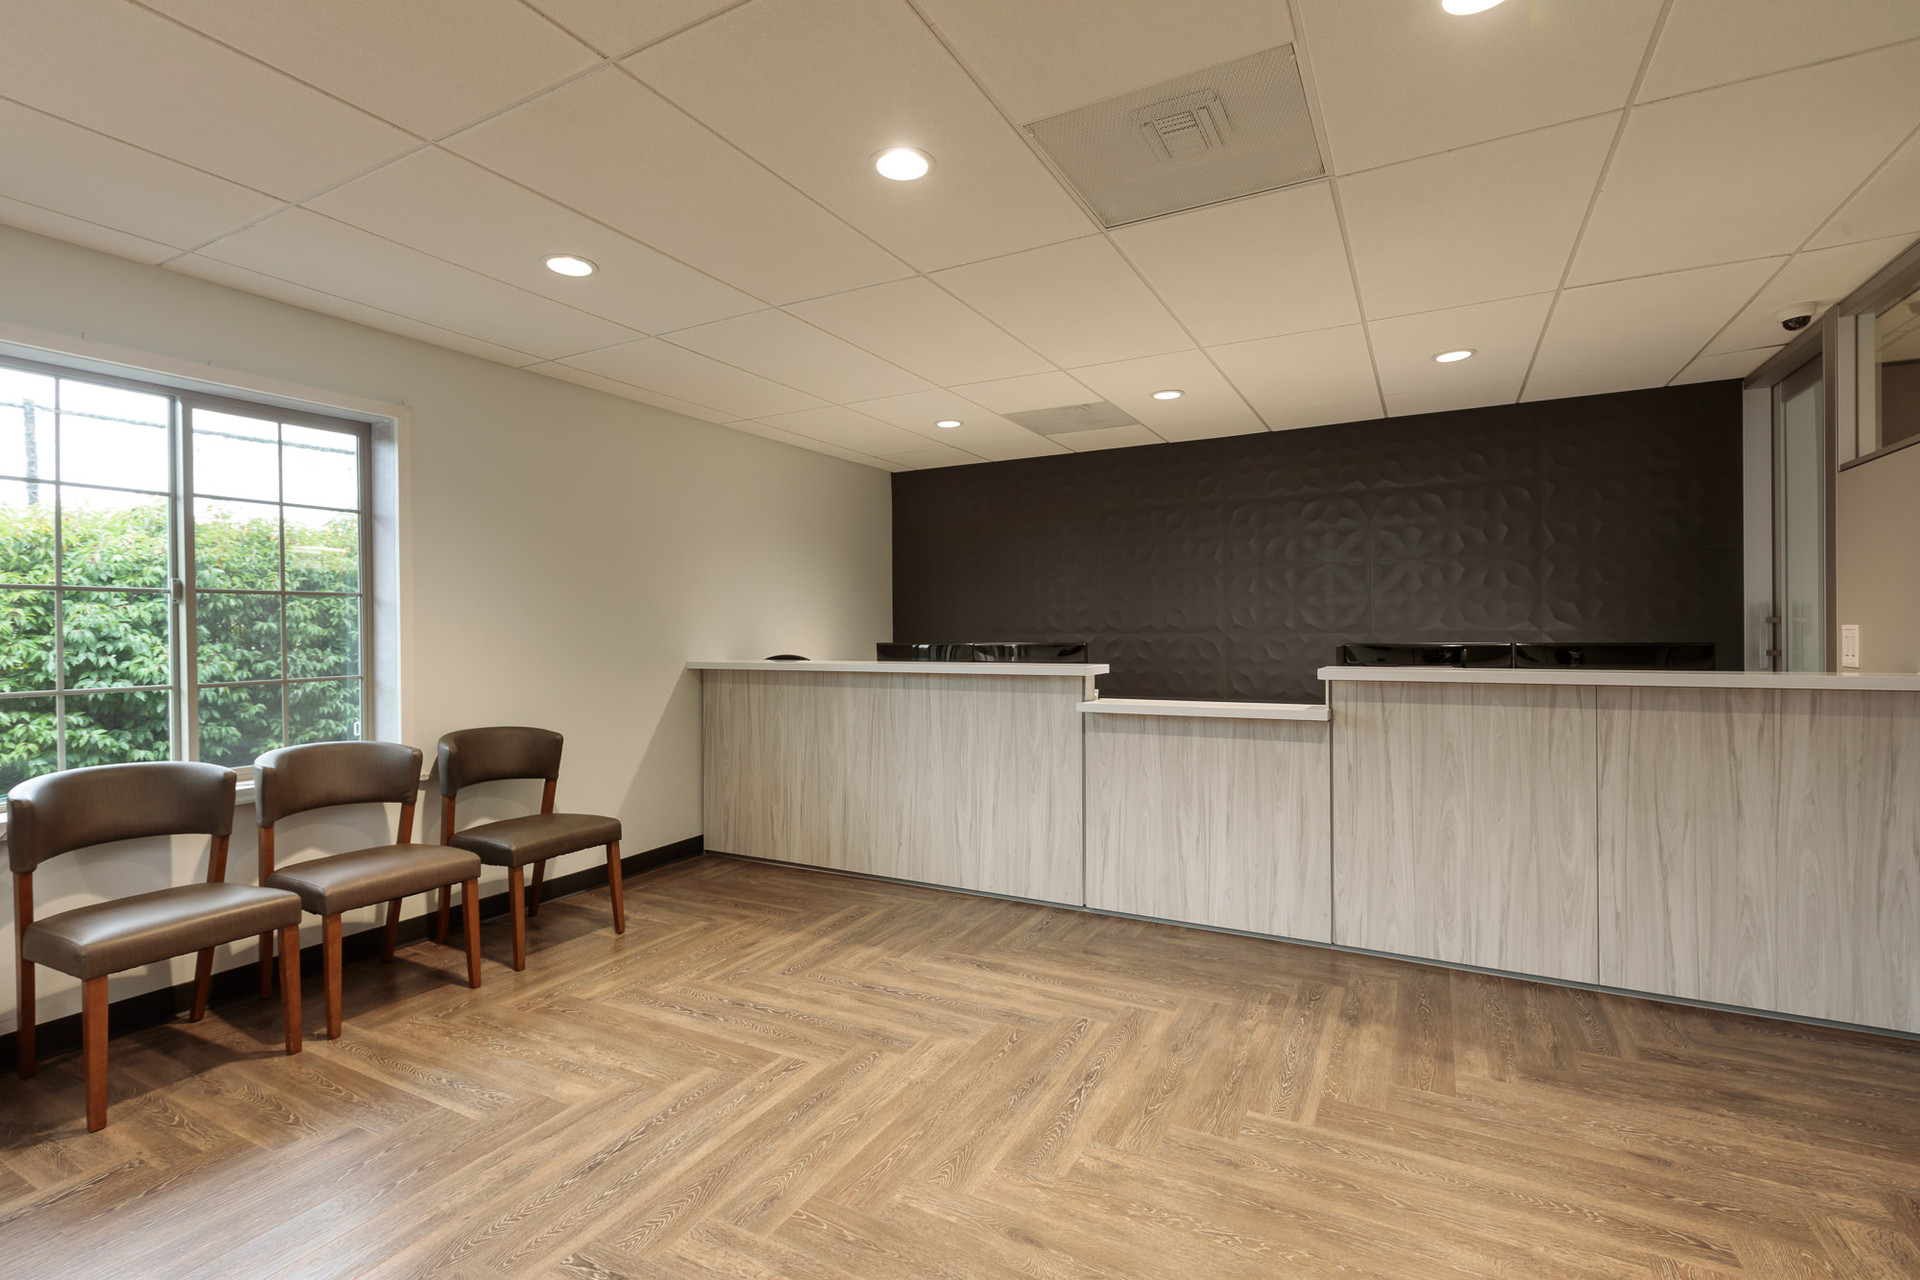 Comprehensive Interventional Care Center